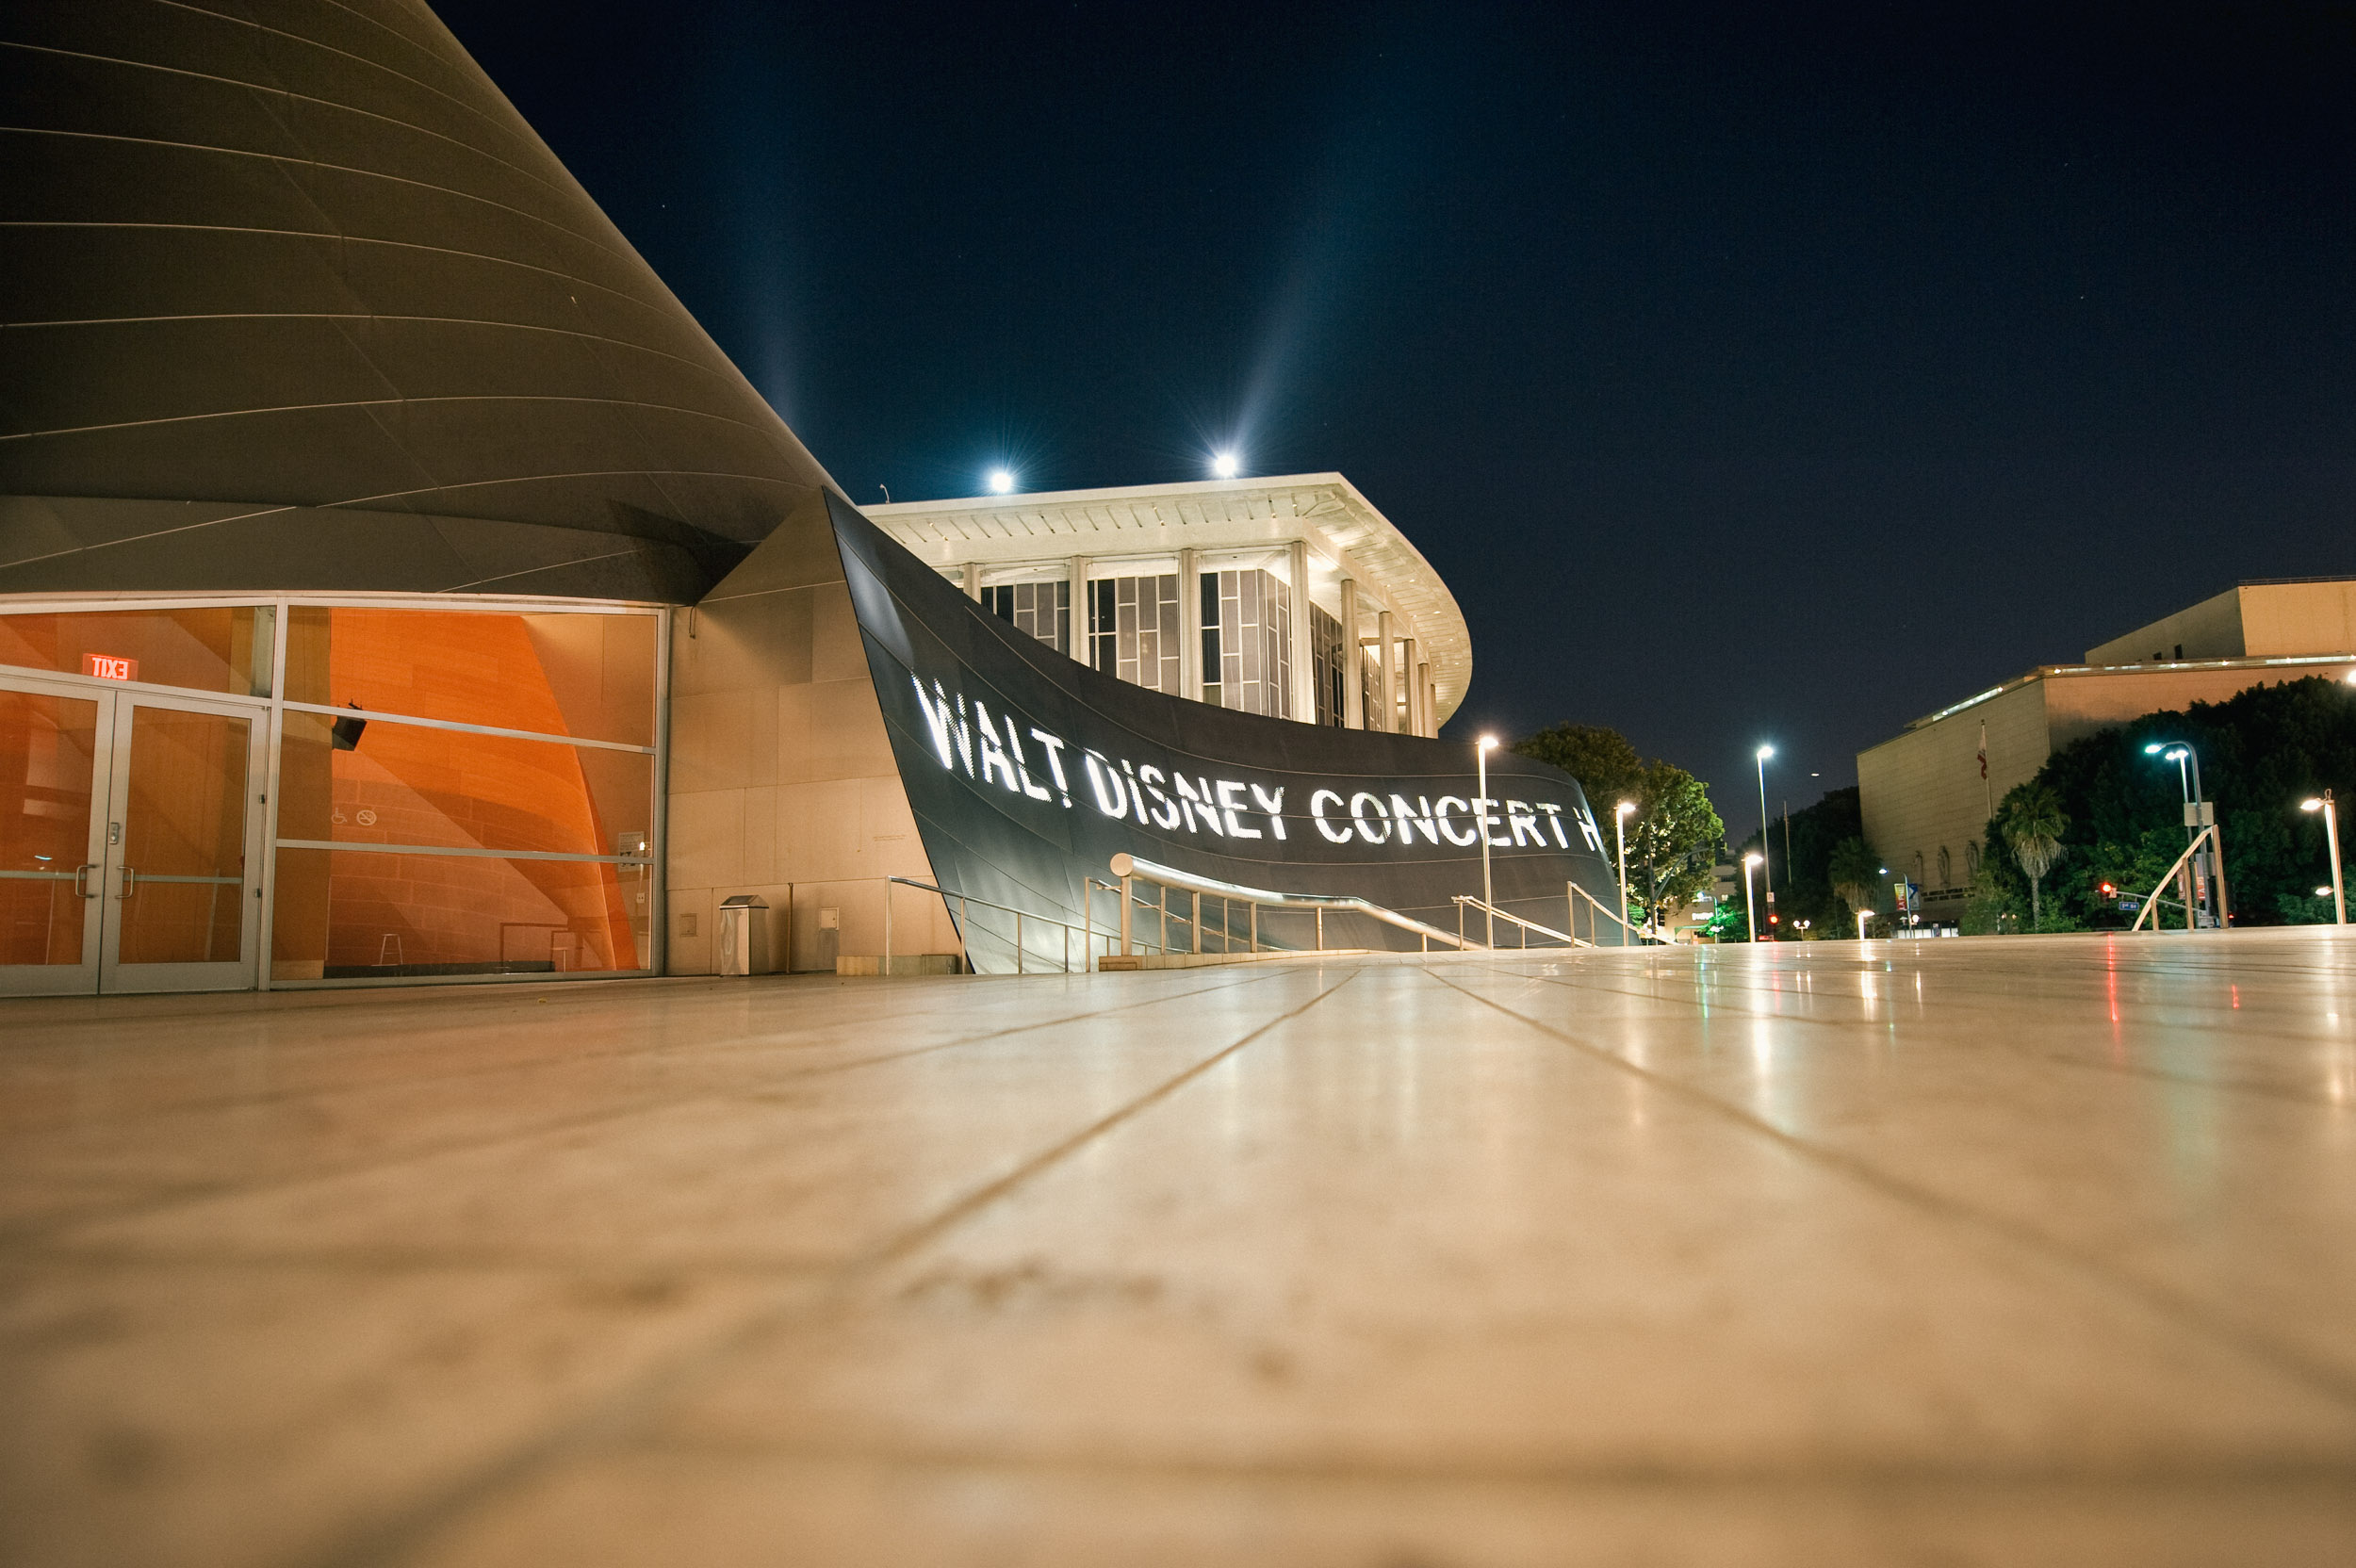 concerthall14_2500.jpg